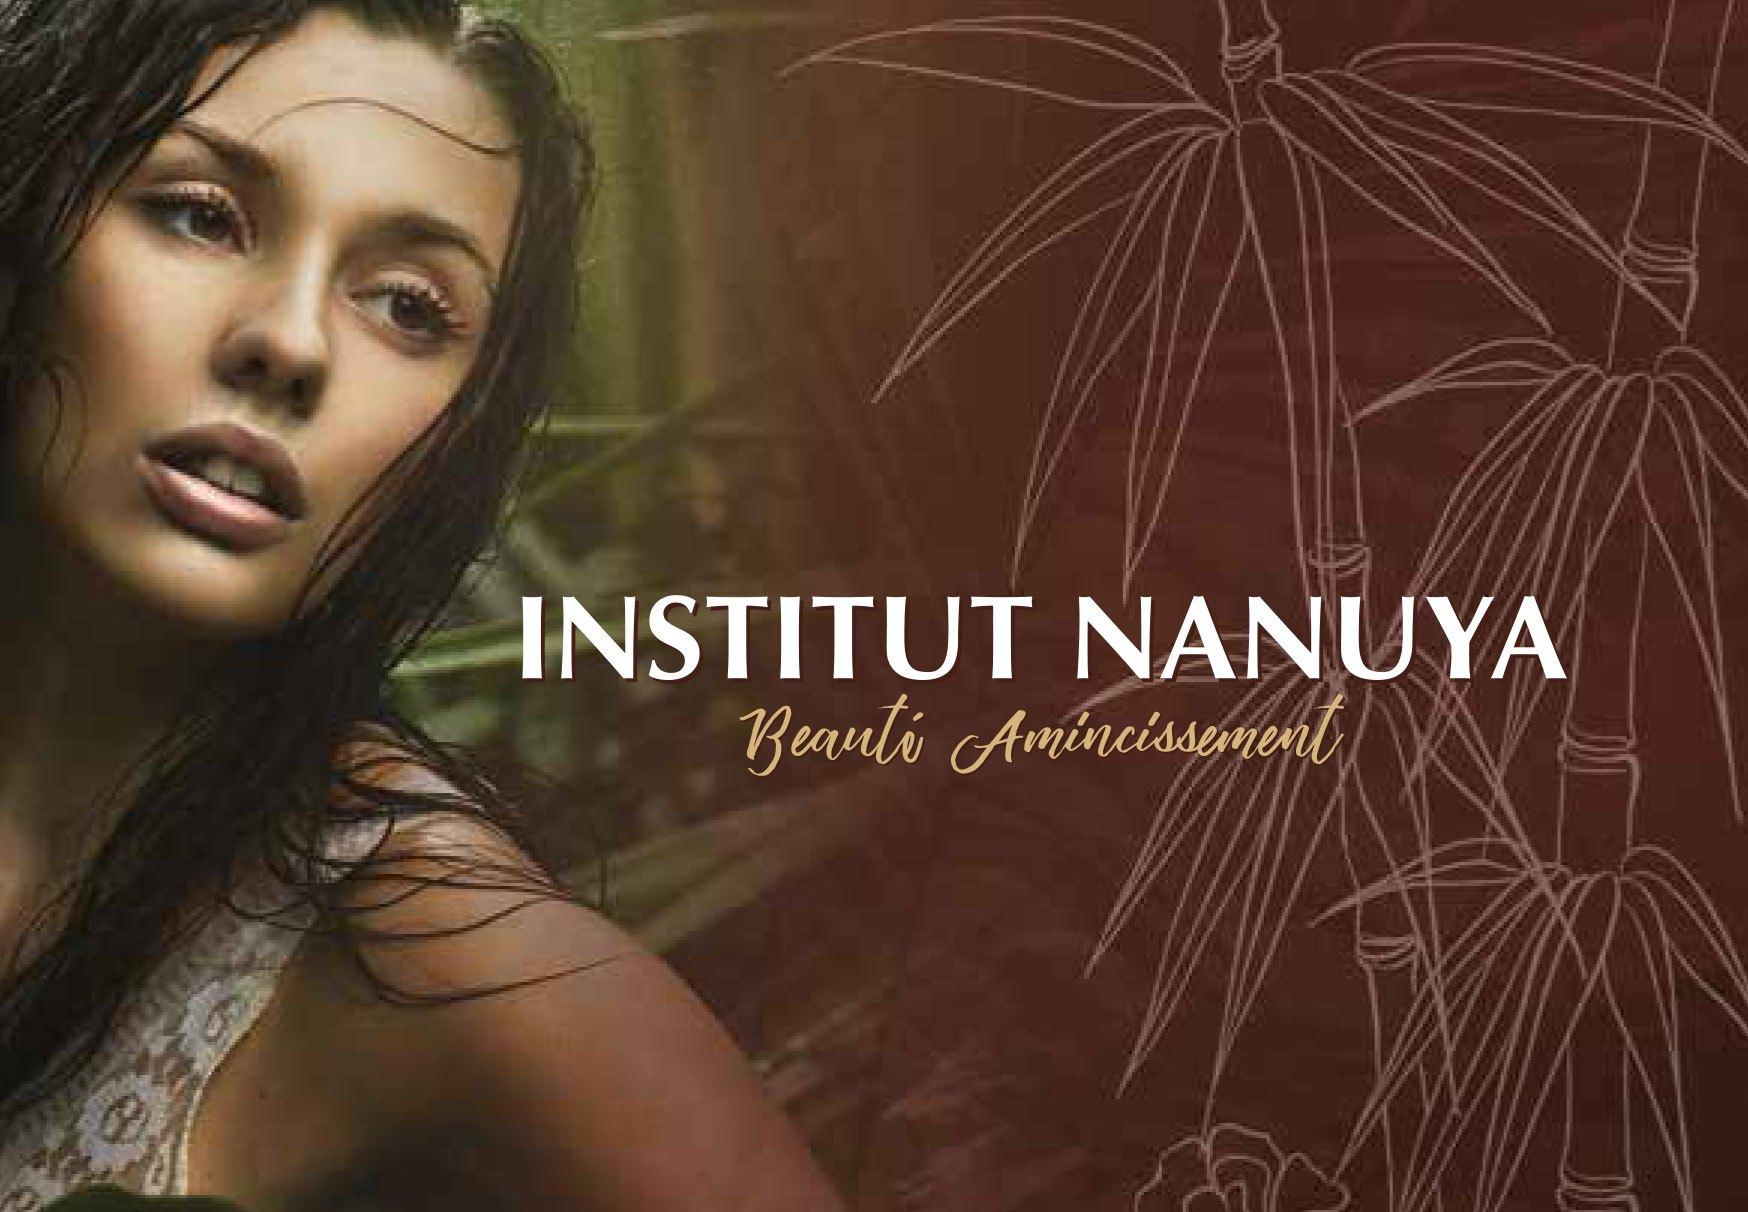 Institut beaute Nanuya